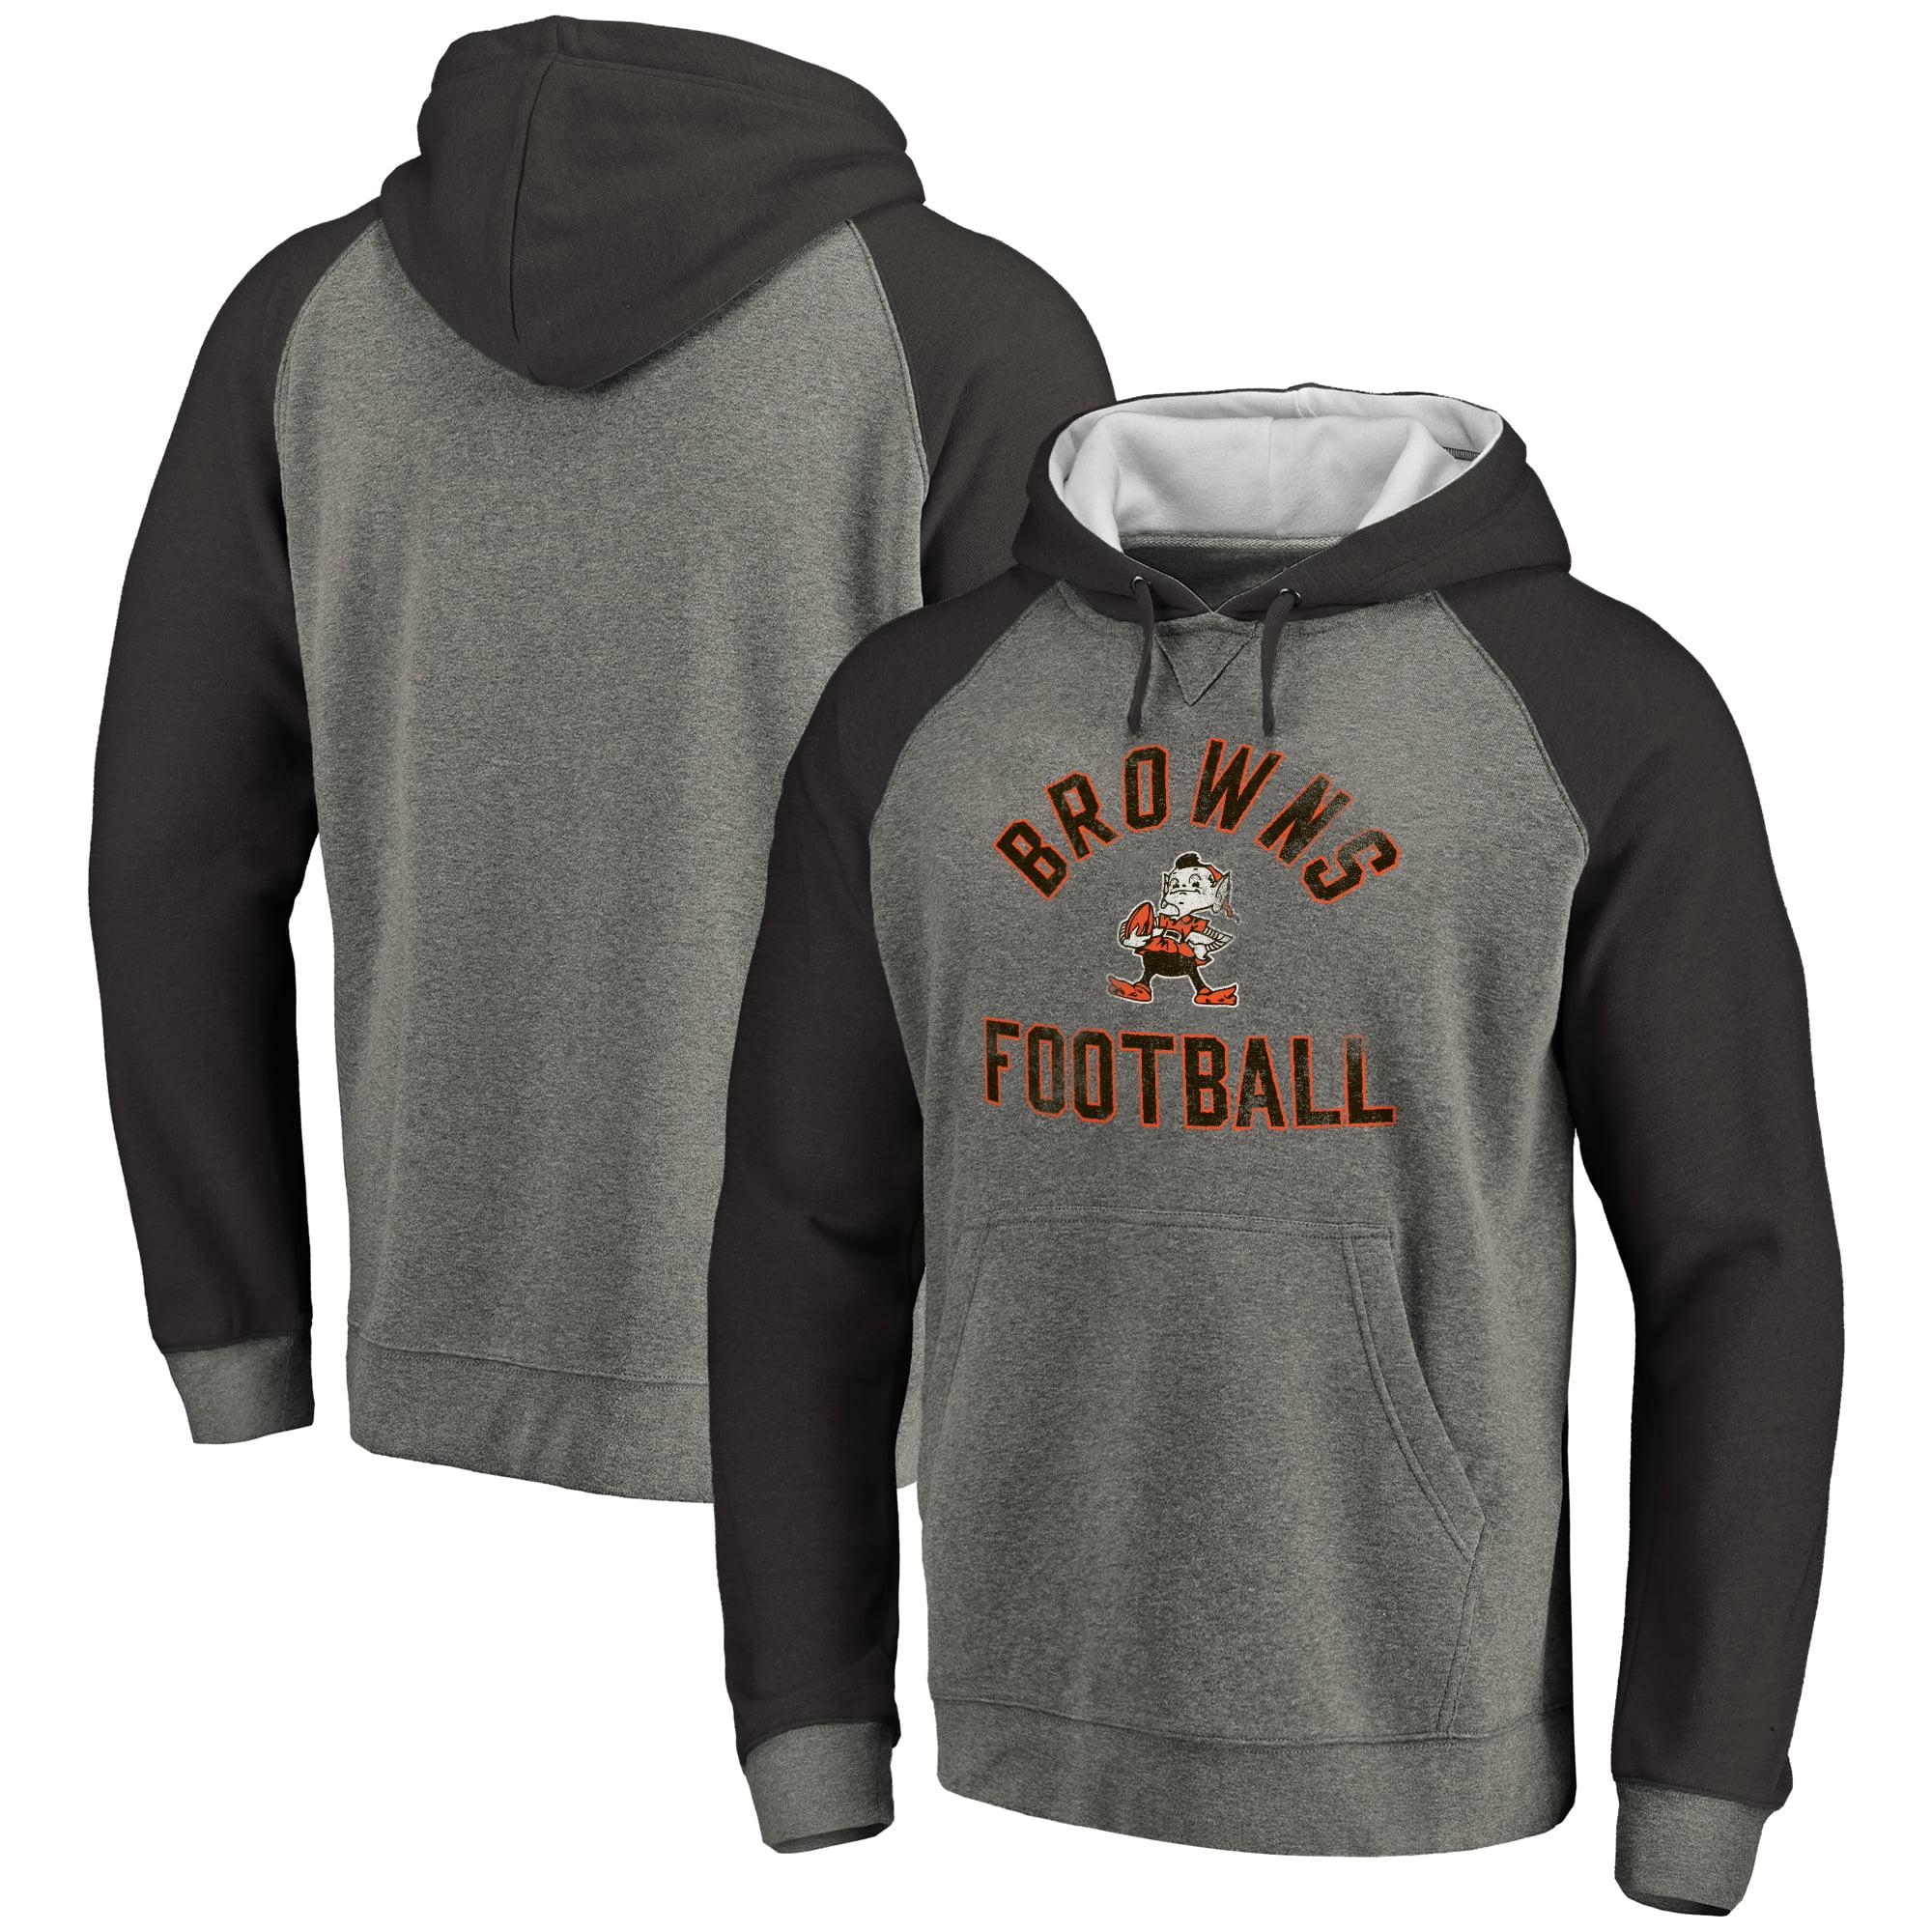 Cleveland Browns NFL Pro Line Comfort Tri-Blend Pullover Hoodie - Gray/Black